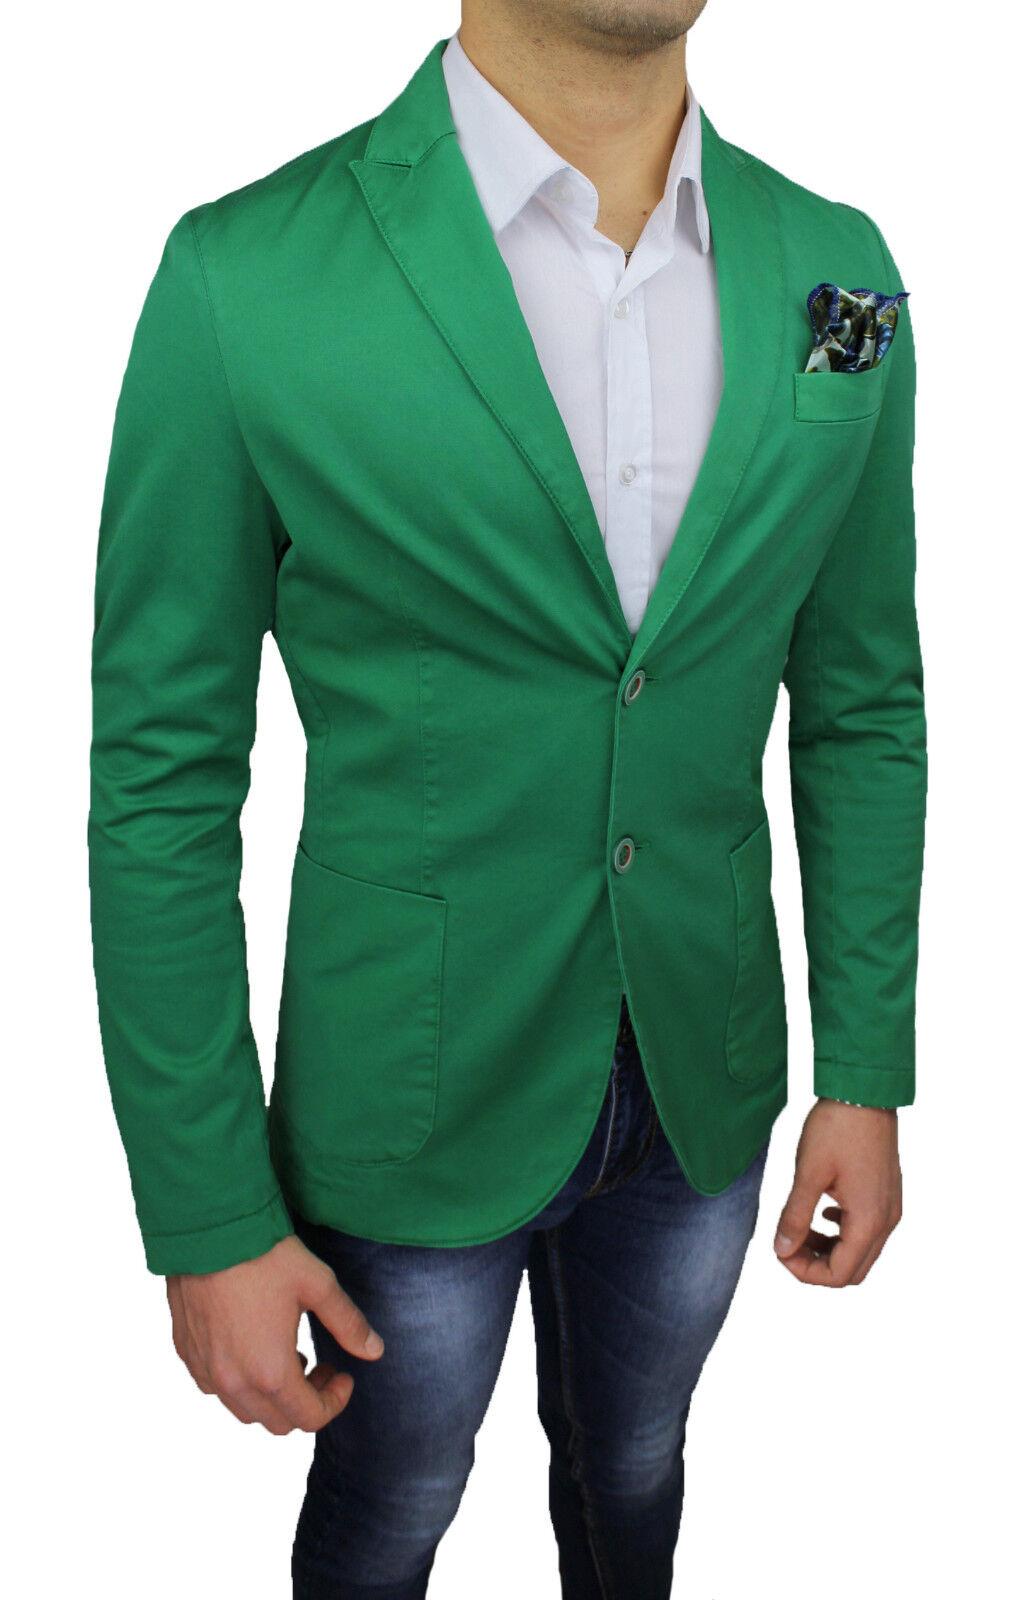 GIACCA BLAZER men A. GILLES SARTORIALE green SLIM FIT NUOVA CASUAL ELEGANTE